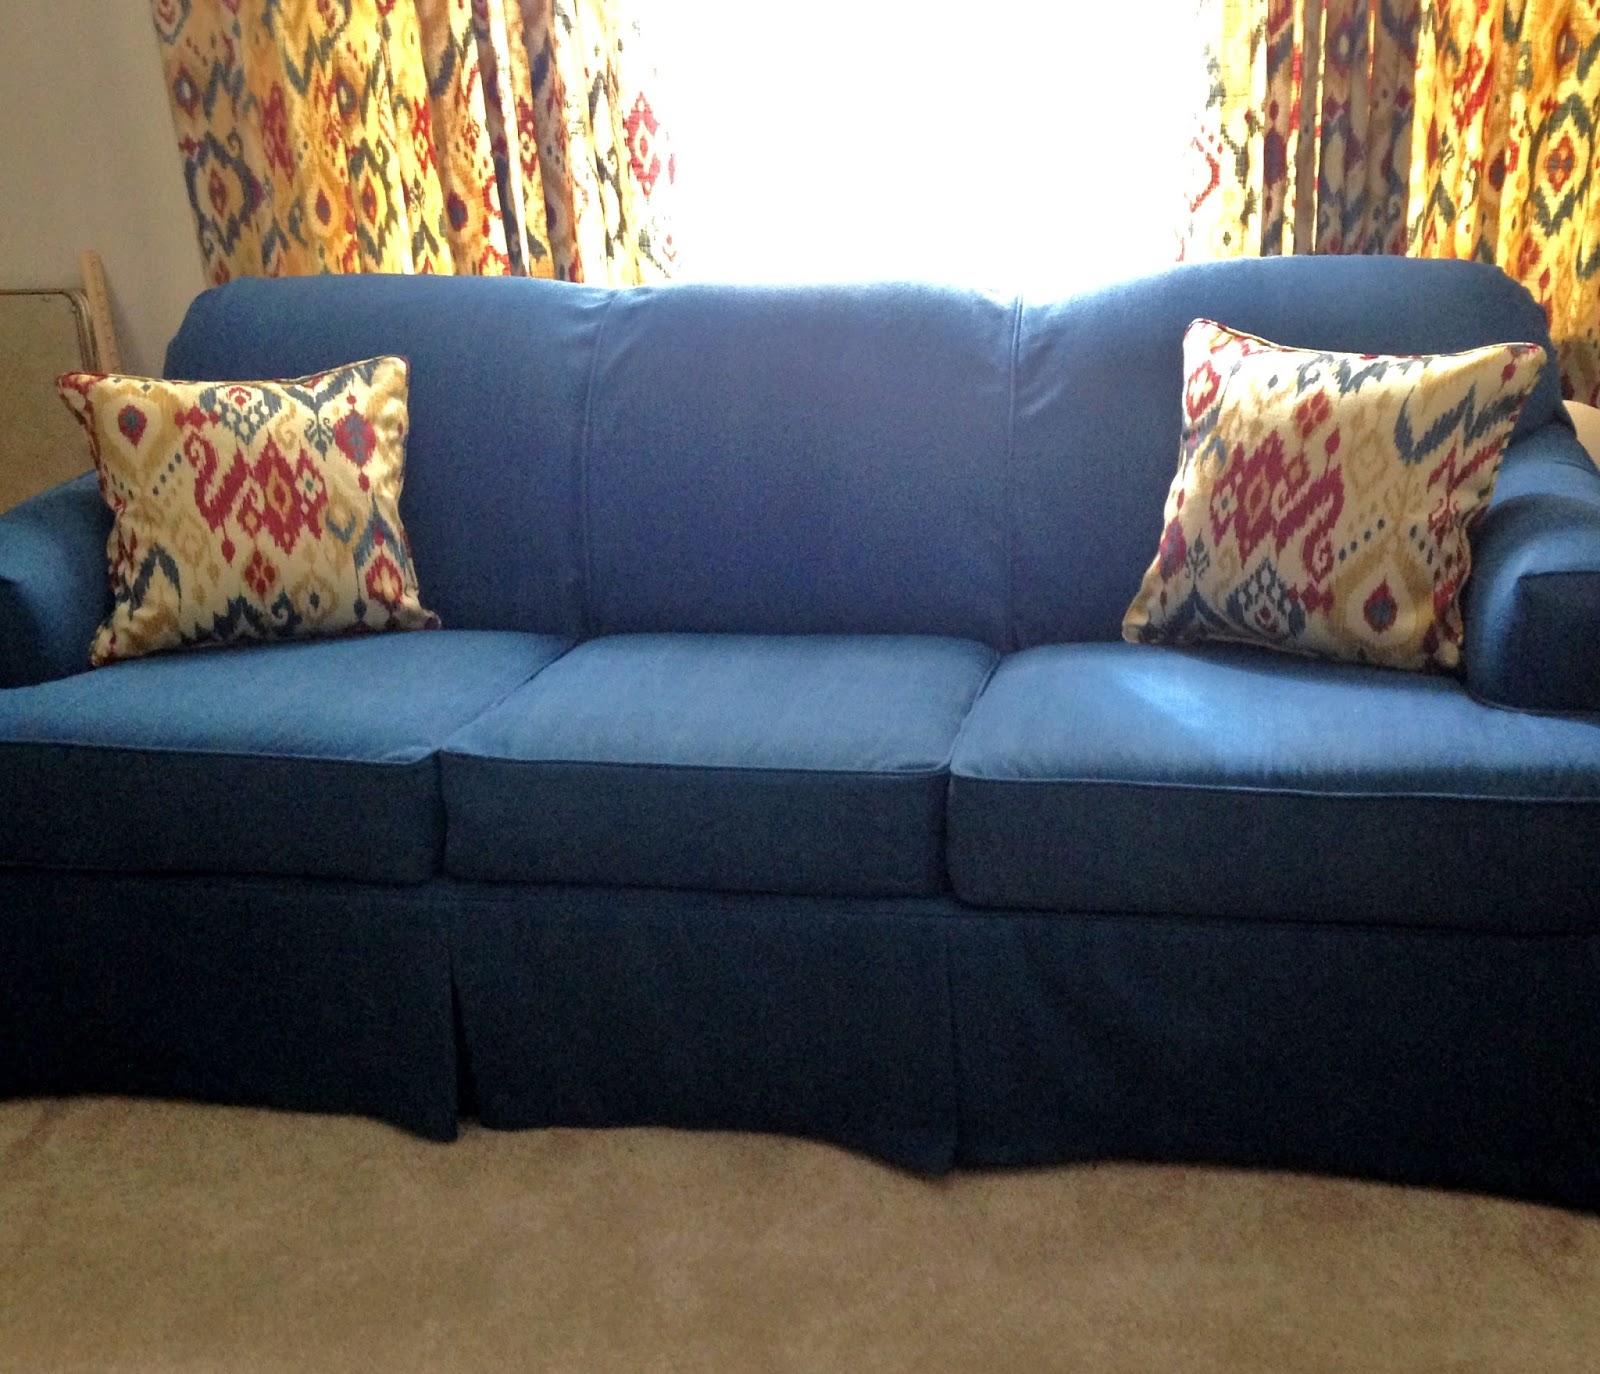 Pam Morris Sews Denim On A Sleeper Sofa